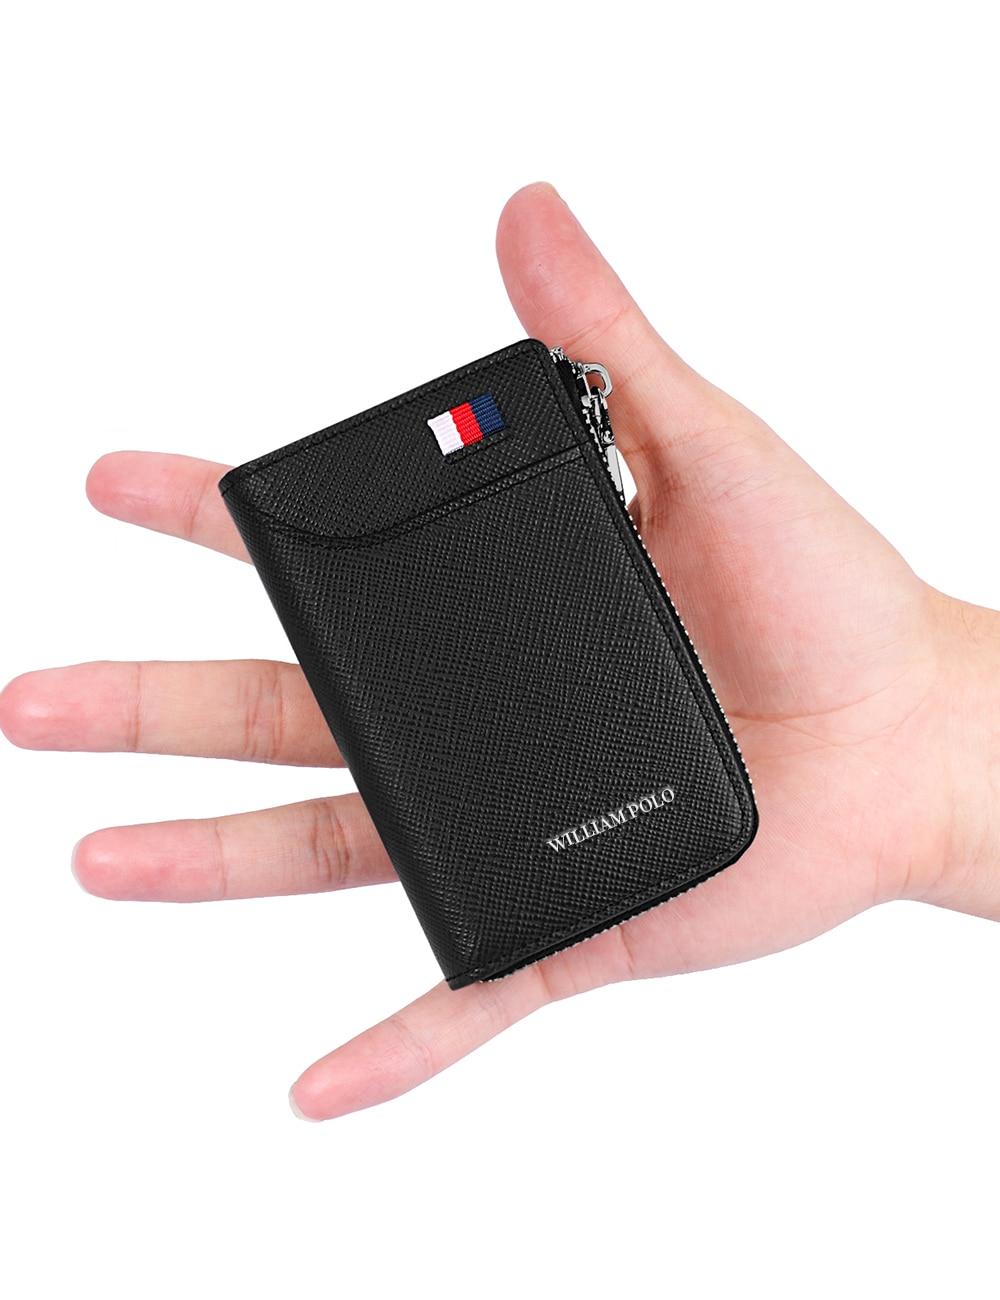 WilliamPOLO Men Wallet Accordion Credit Card Holder Genuine Leather Small Multi Card Case Organizer Zipper Claret Black Blue